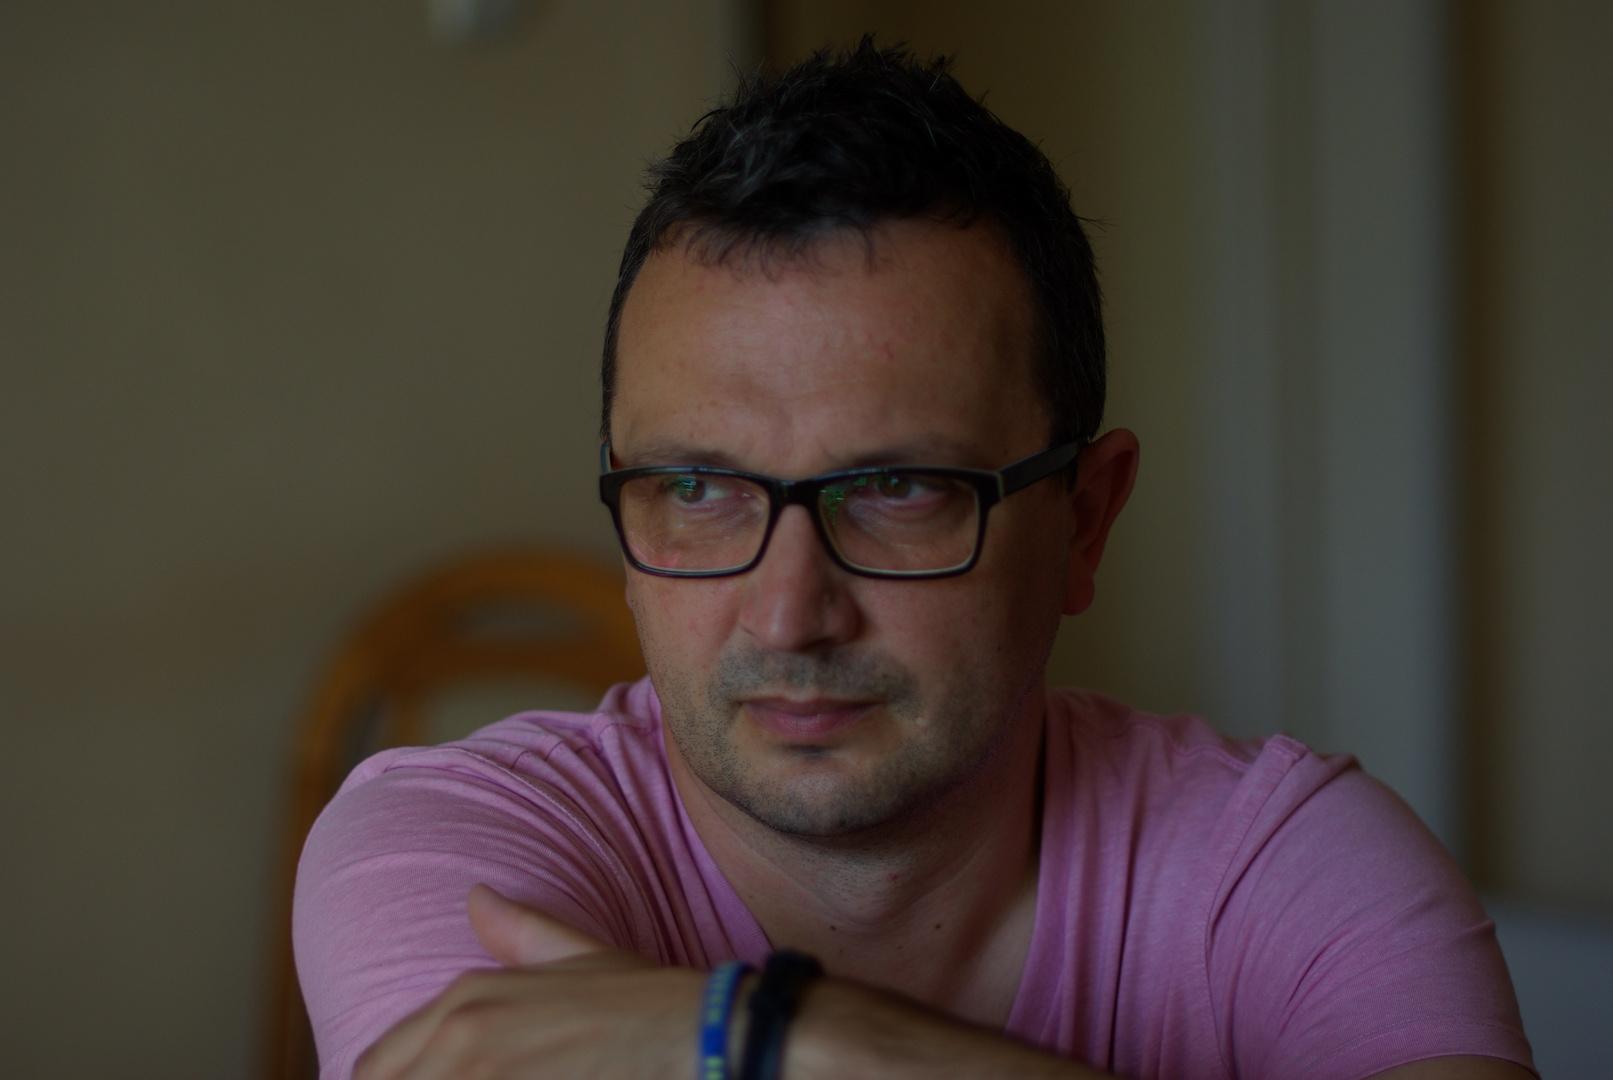 Wojciech#2